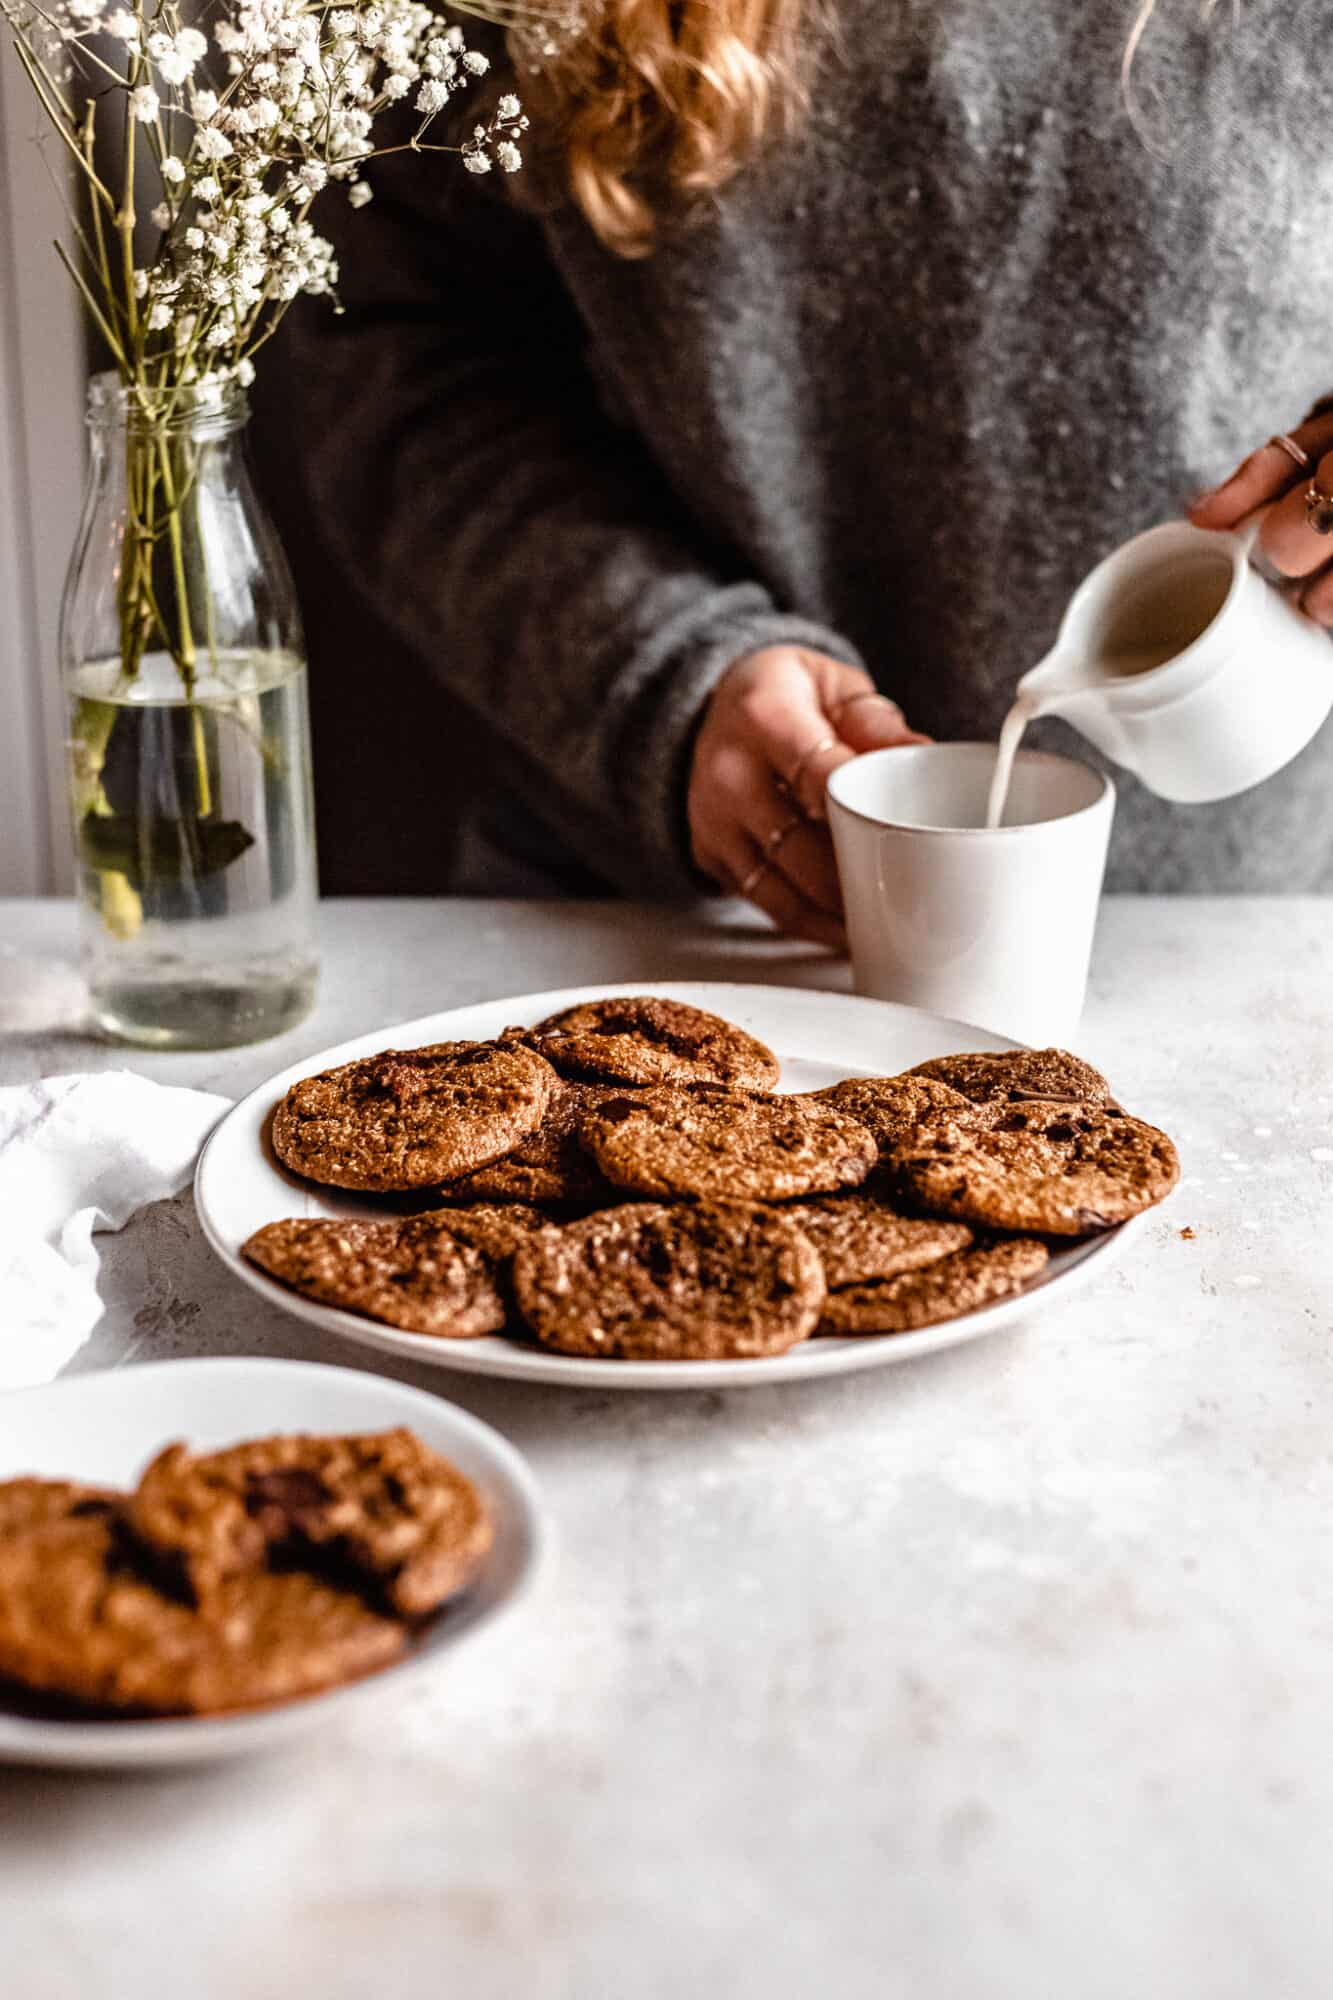 Flourless Peanut Butter Chocolate Chip Cookies Vegan The Banana Diaries